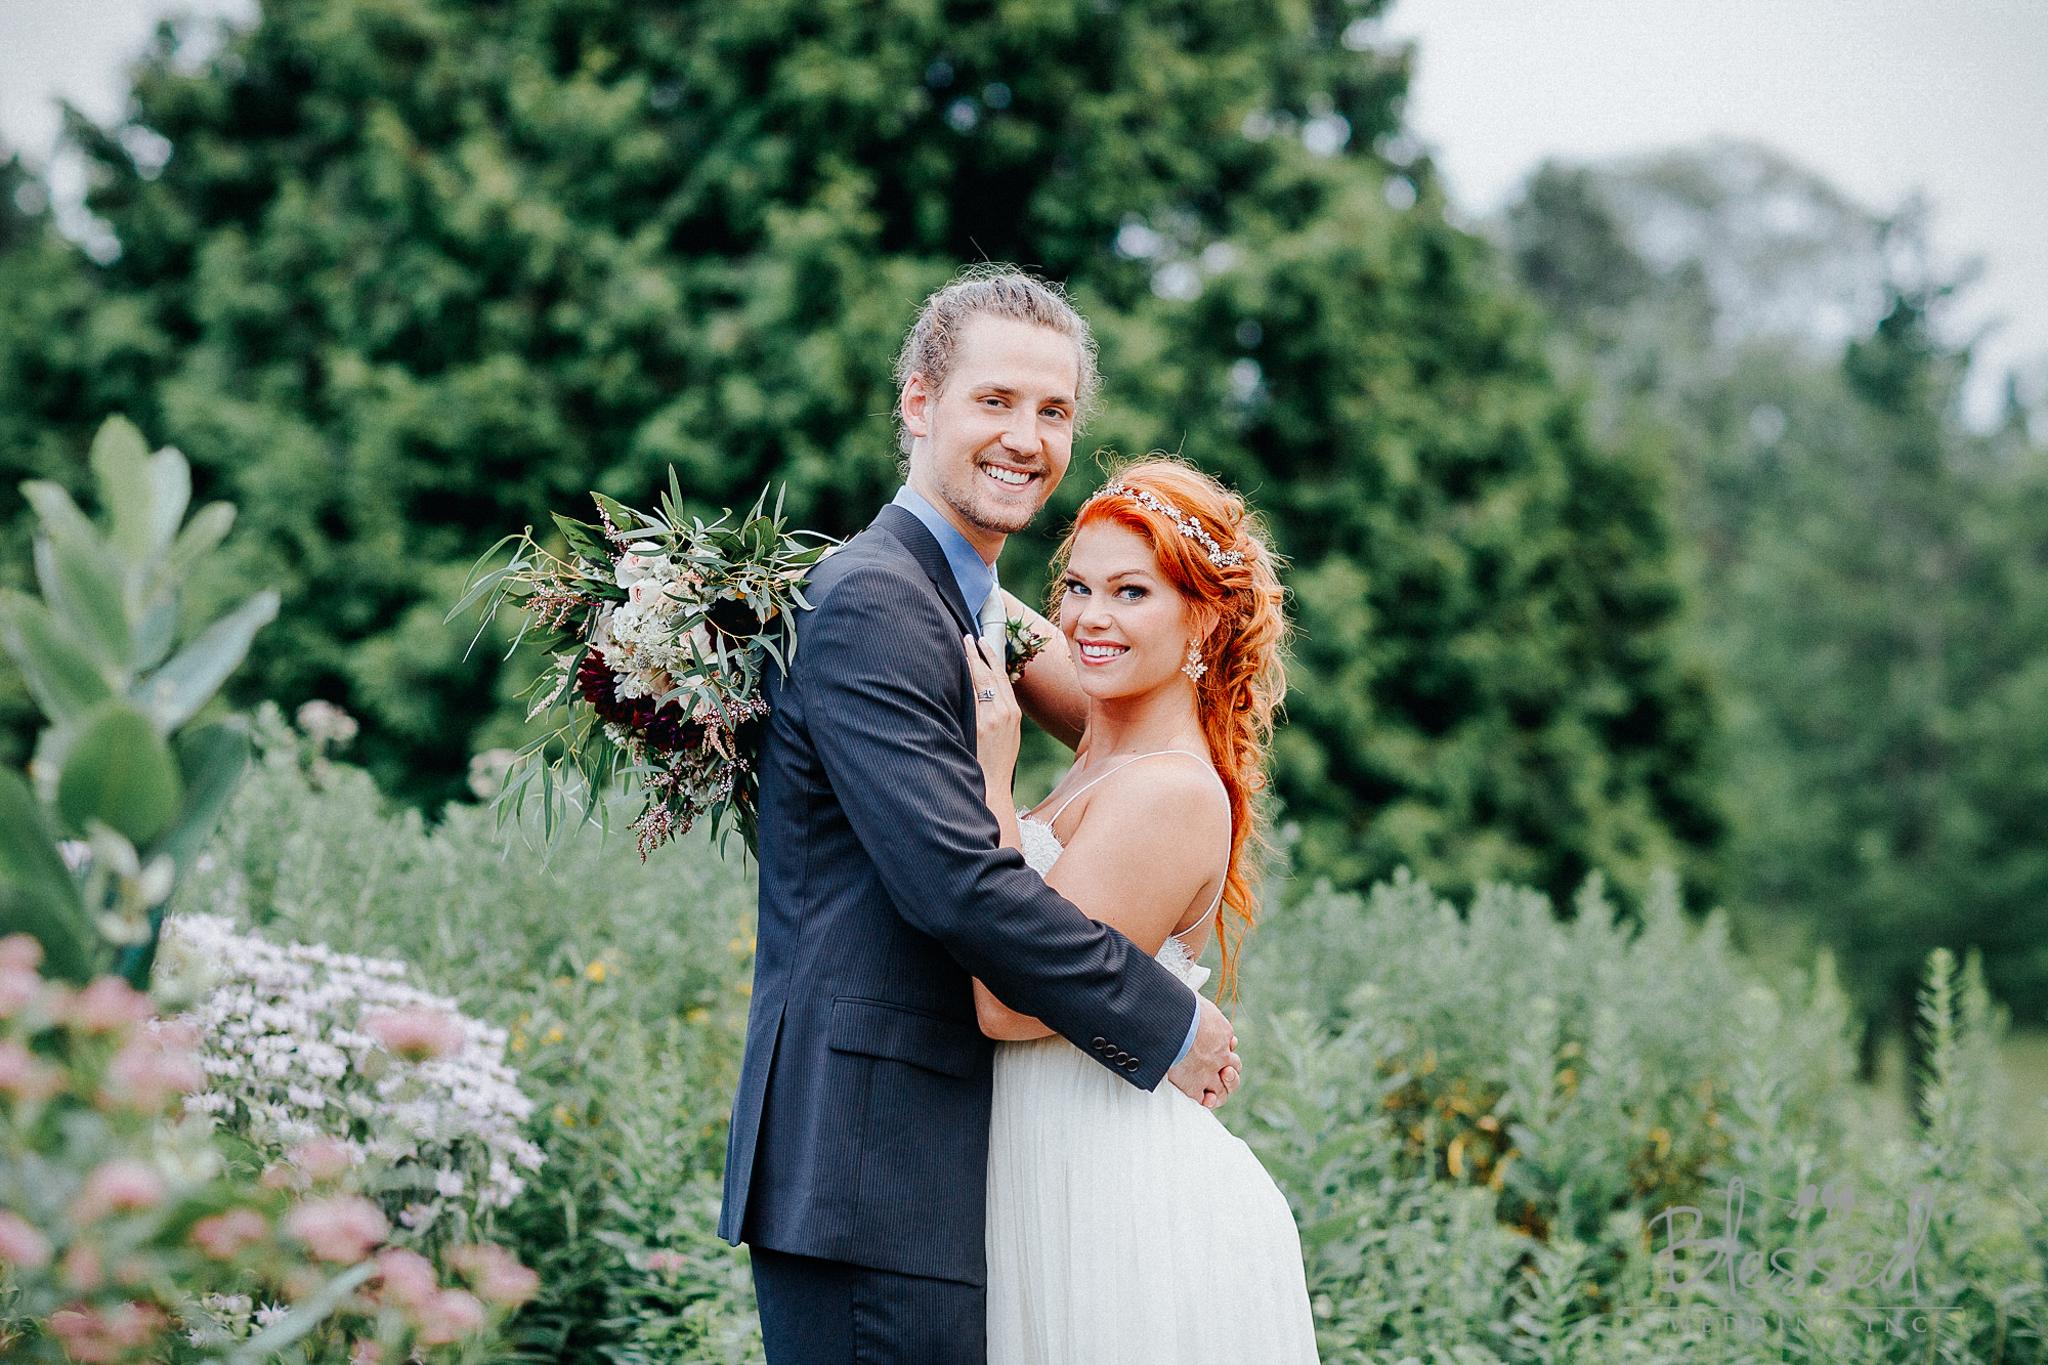 Destination Wedding Photography Minnesota By Blessed Wedding Photographers-35.jpg